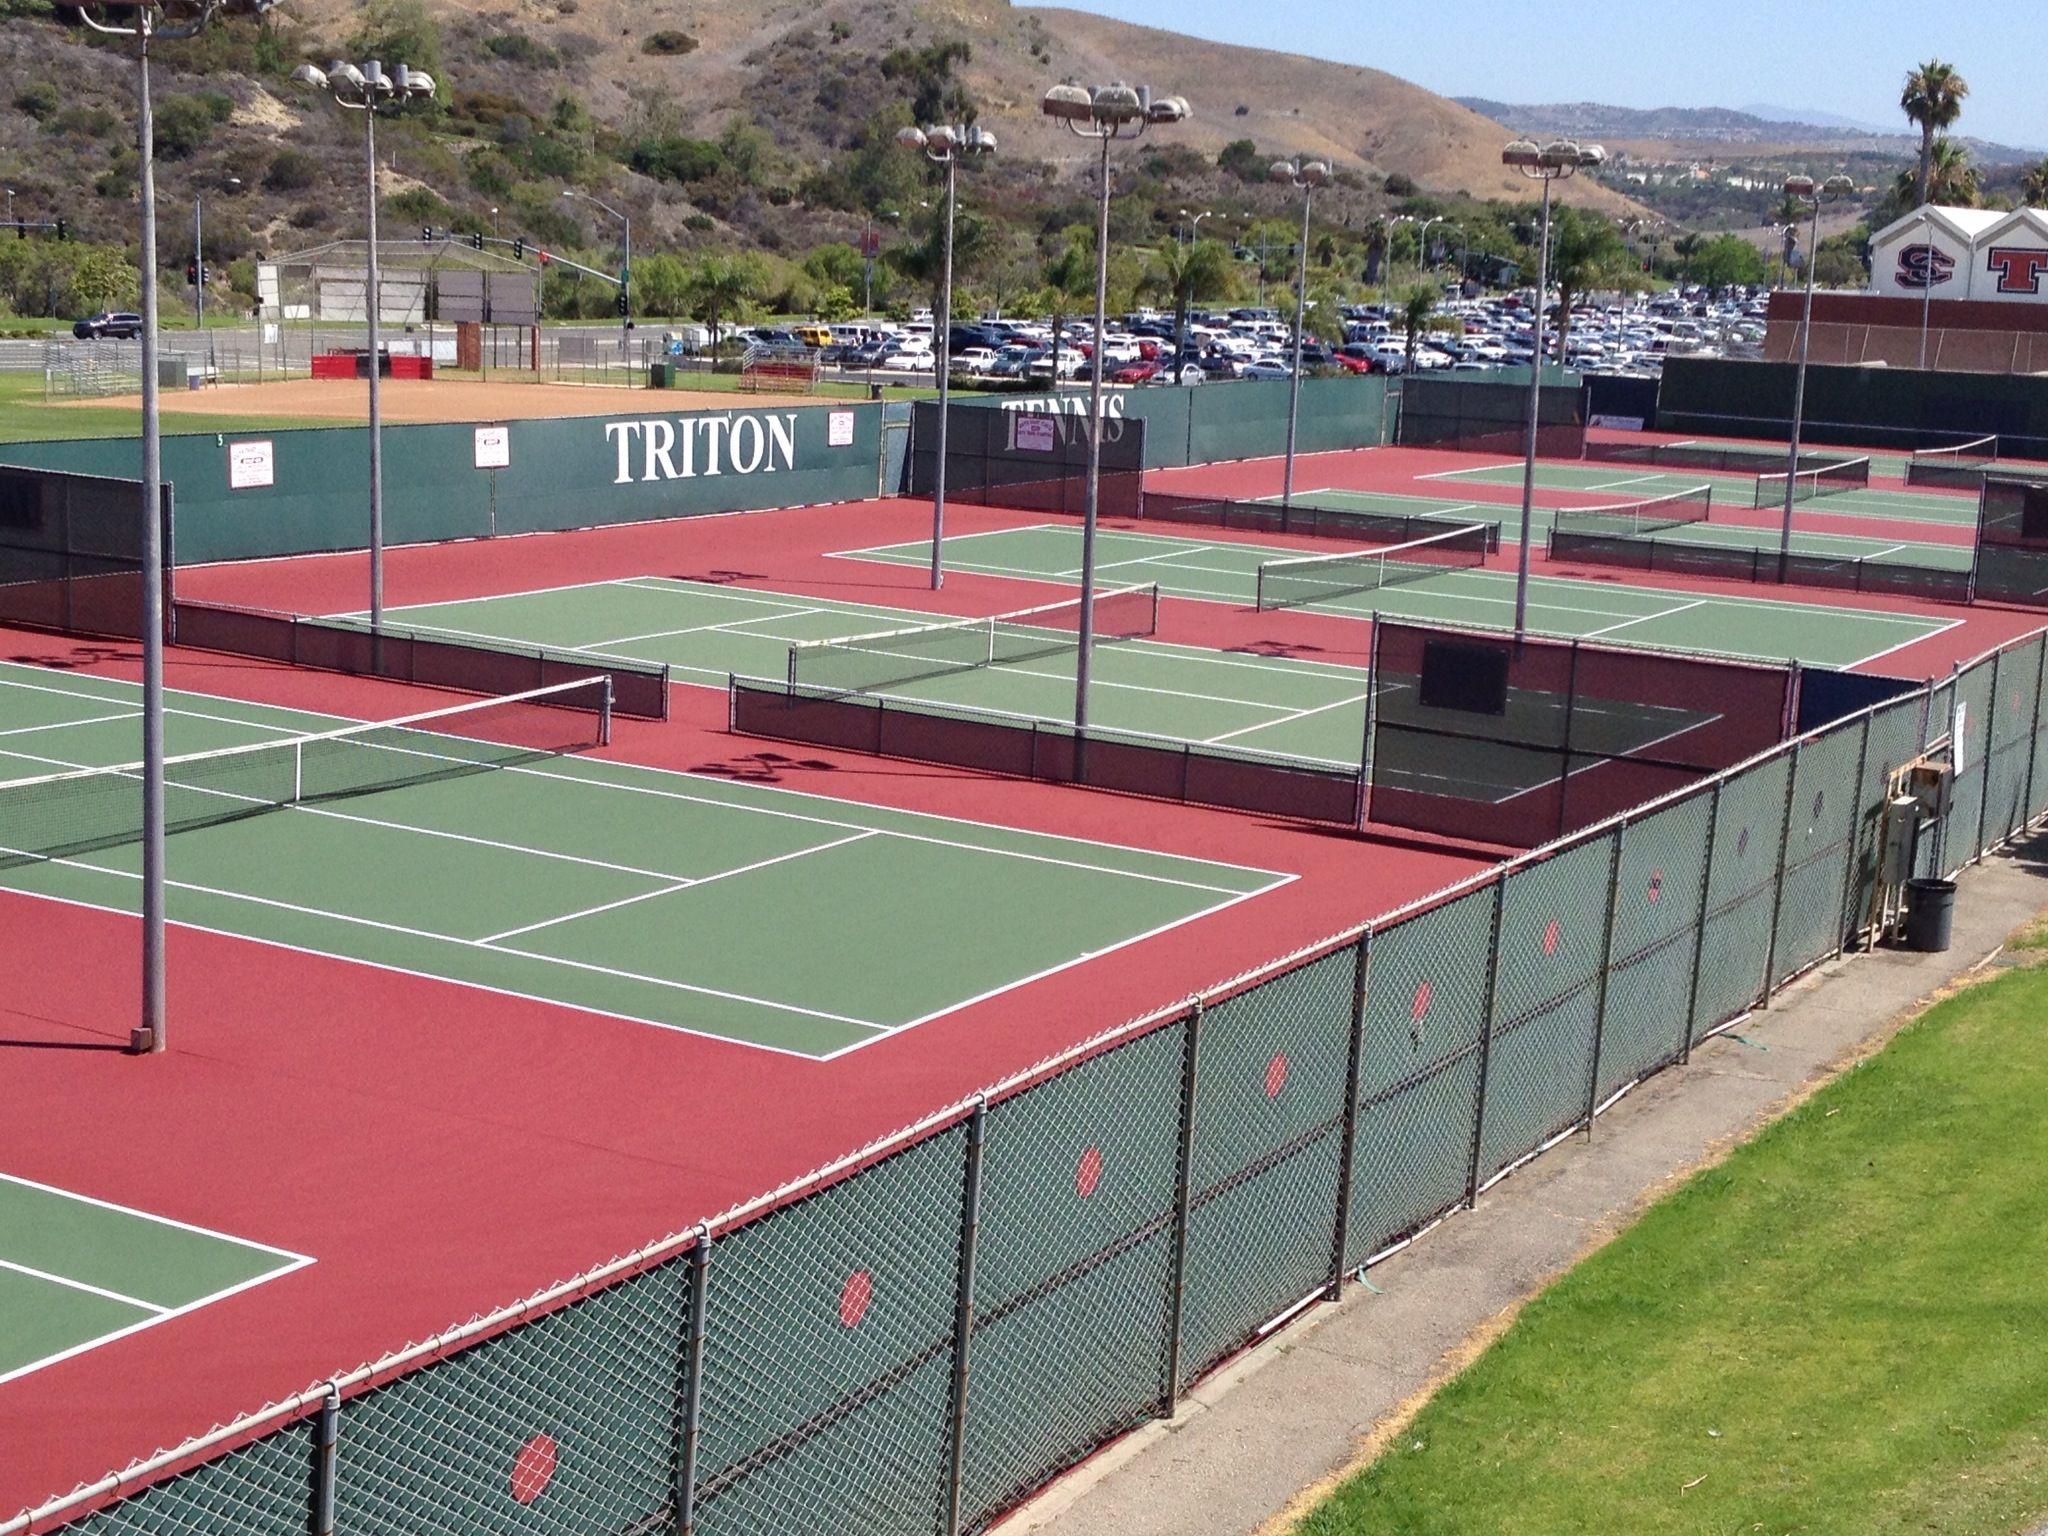 Sportmaster Tenniscourtresurfacing At San Clemente High School In California Quality Installation By Jeff Frantz Prosurfacesports Canchas